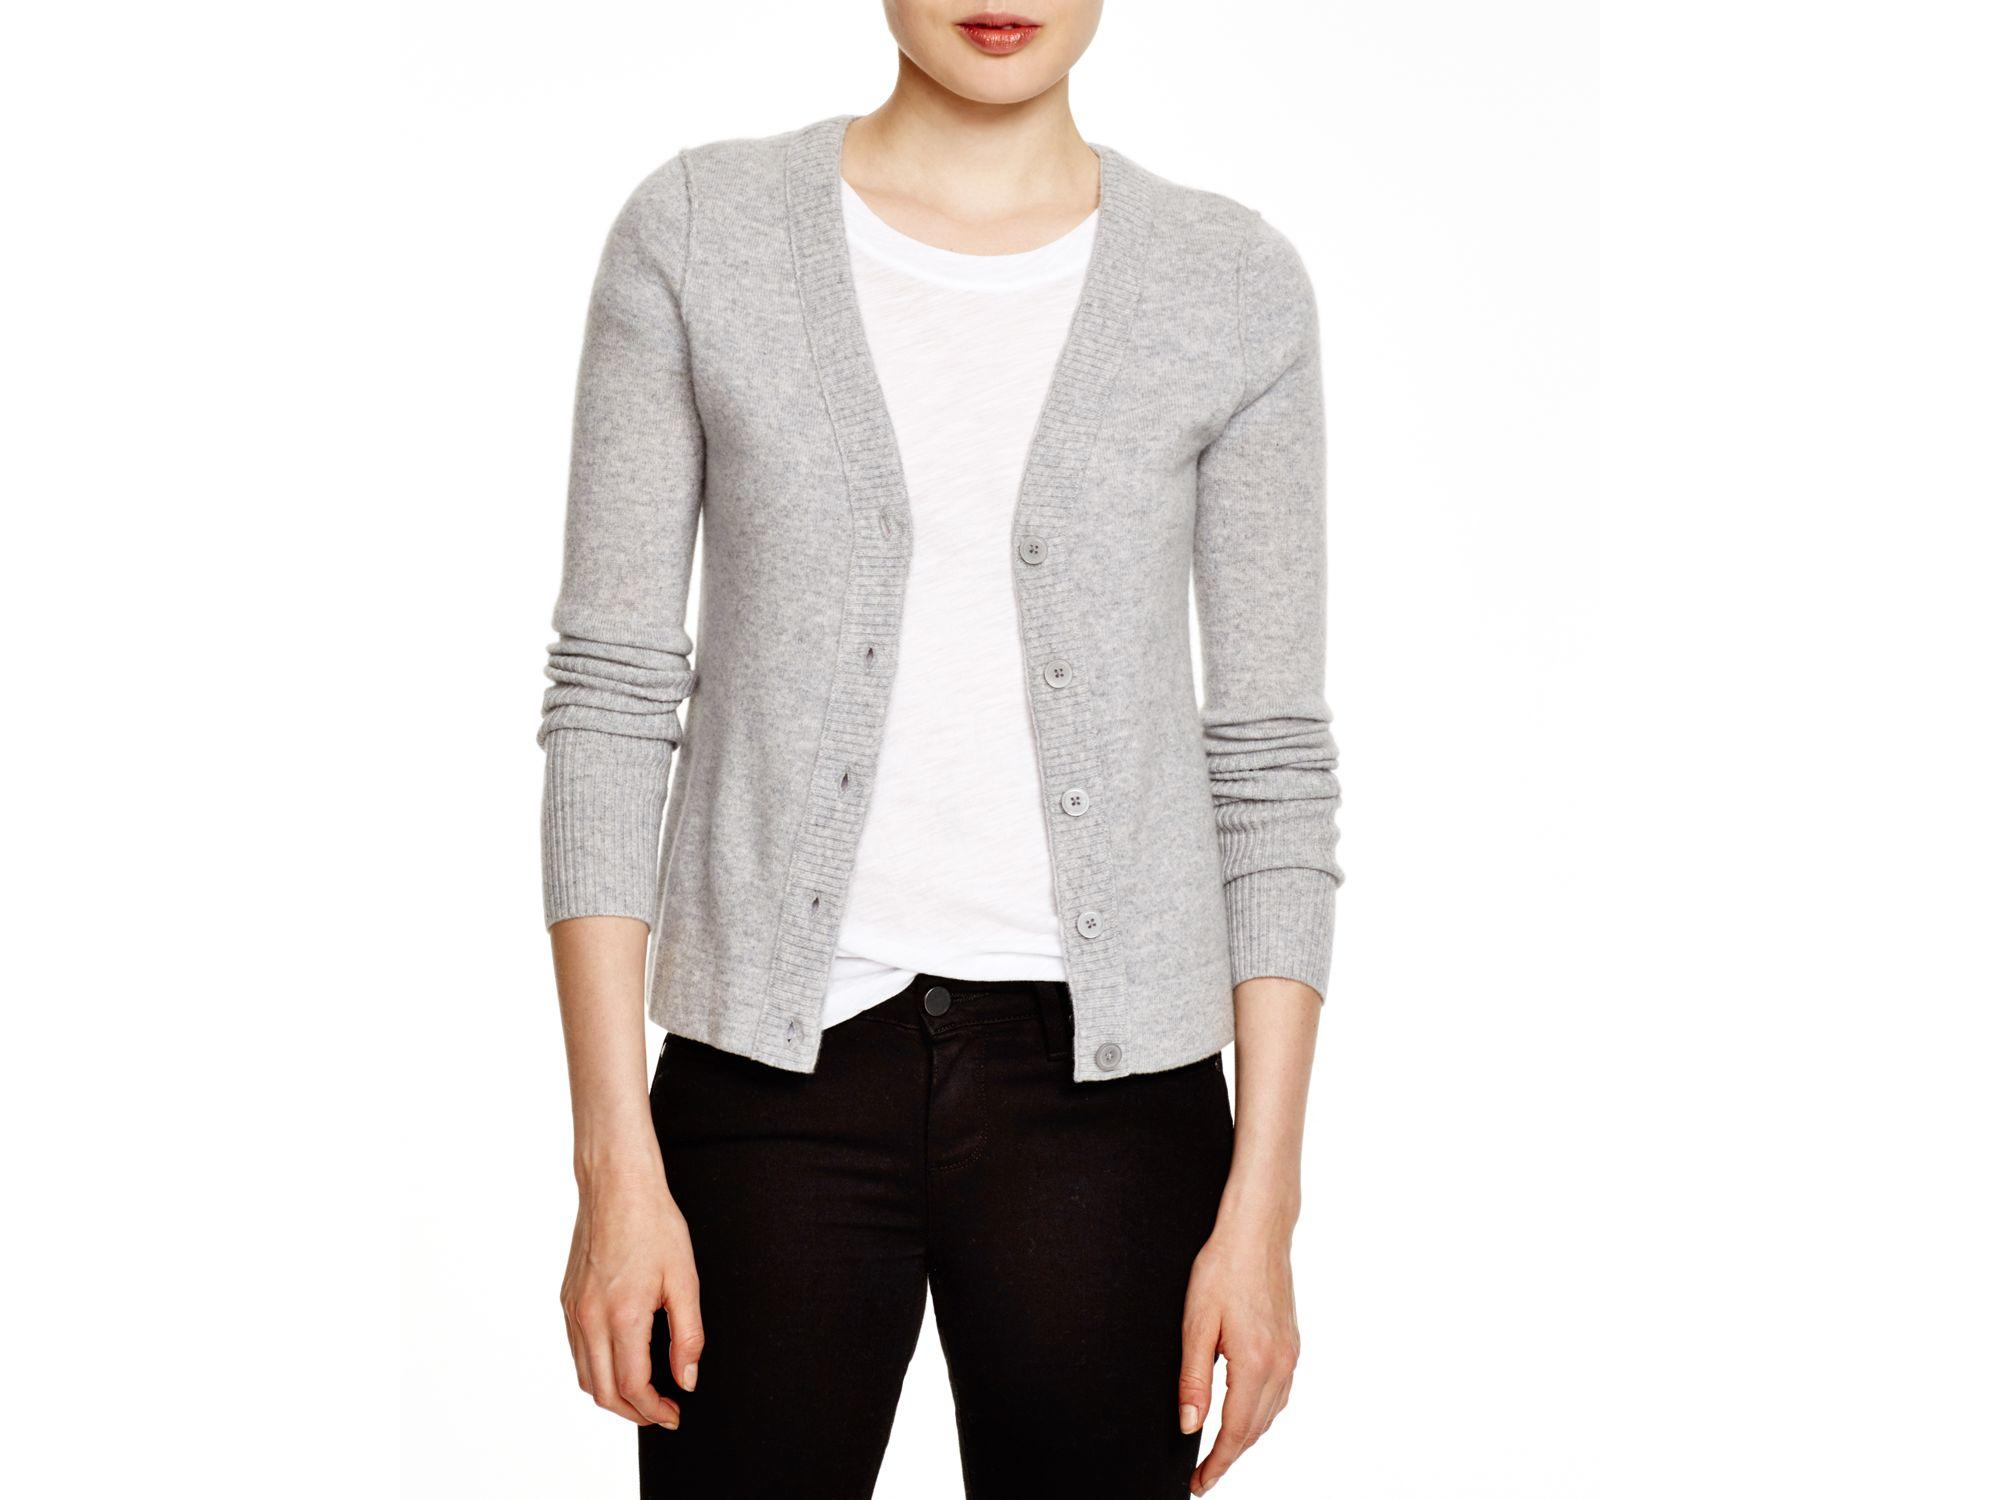 Aqua Cashmere Cashmere V-neck Cardigan in Gray | Lyst